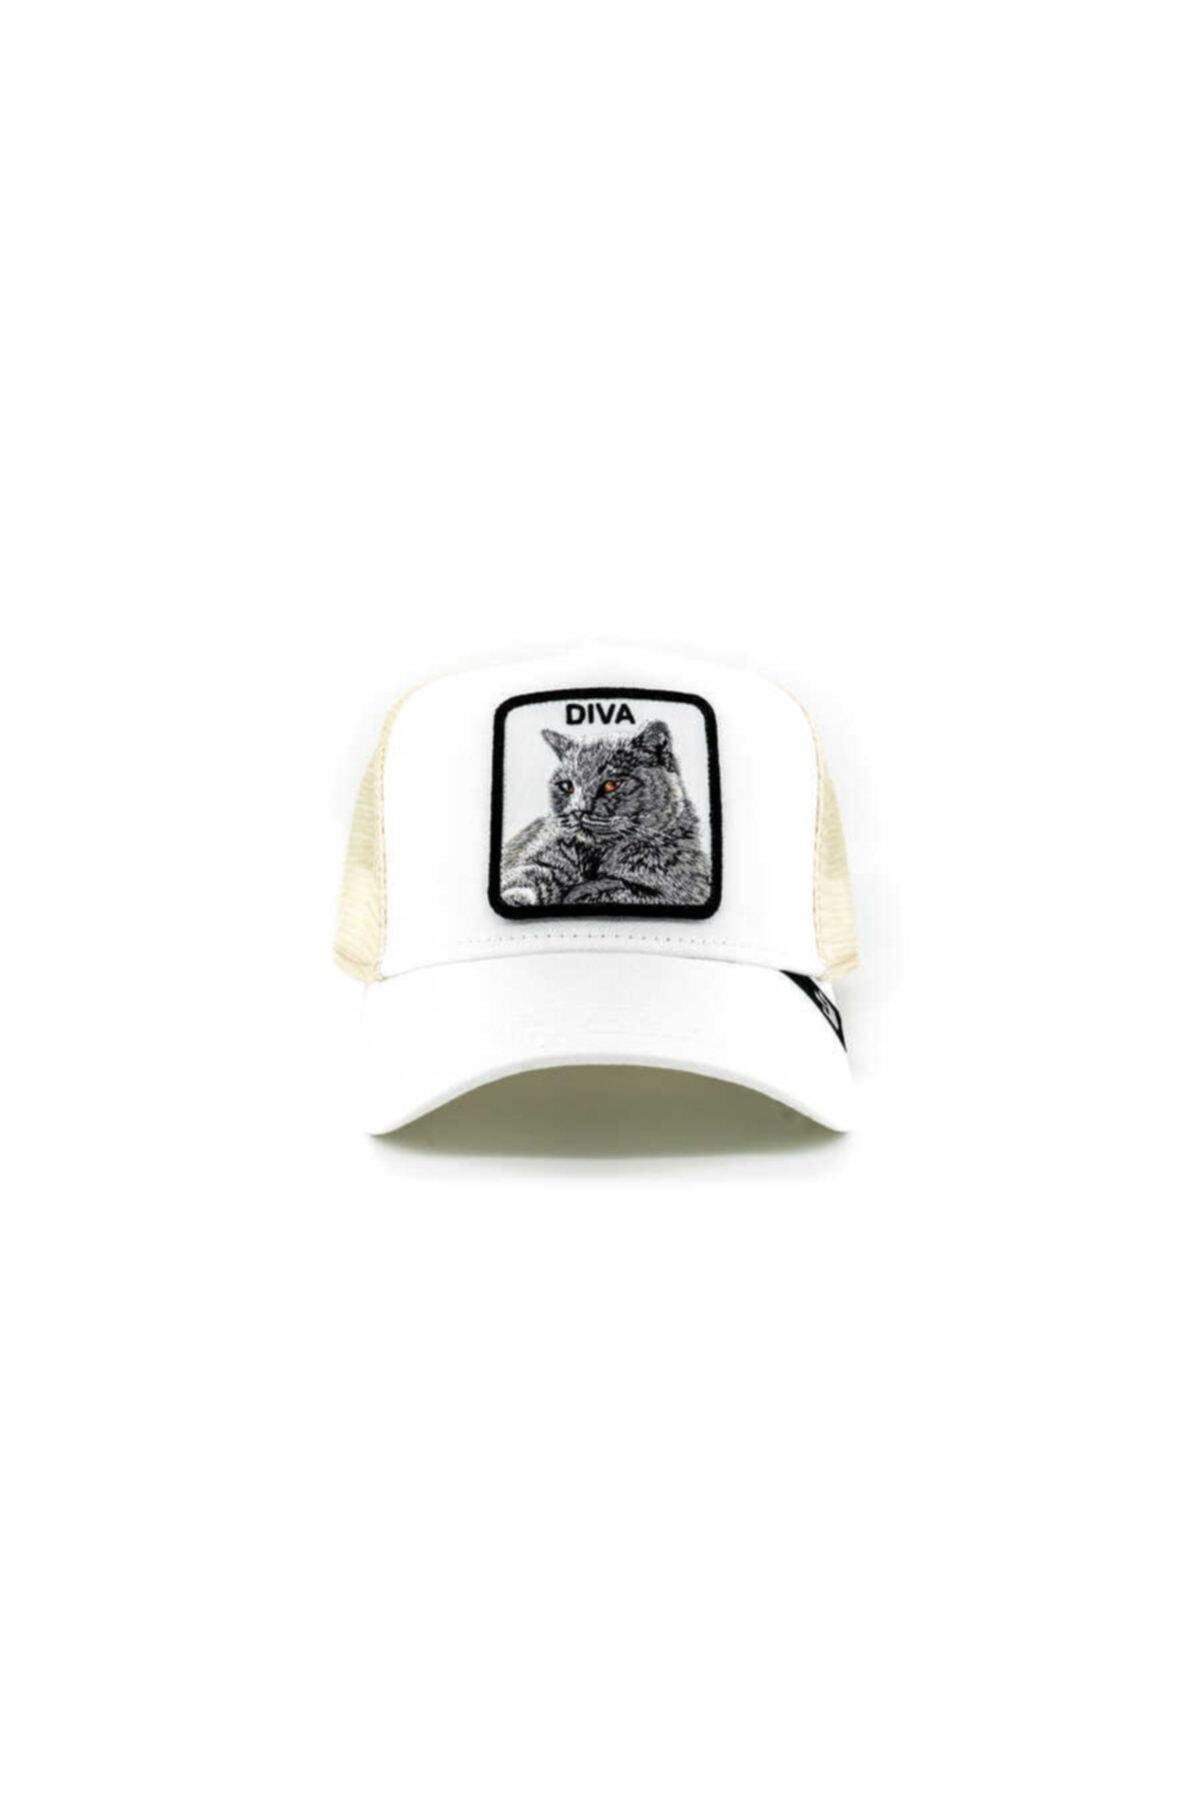 Goorin Bros Unisex Diva Stance Beyaz Standart Şapka 101-0727 1